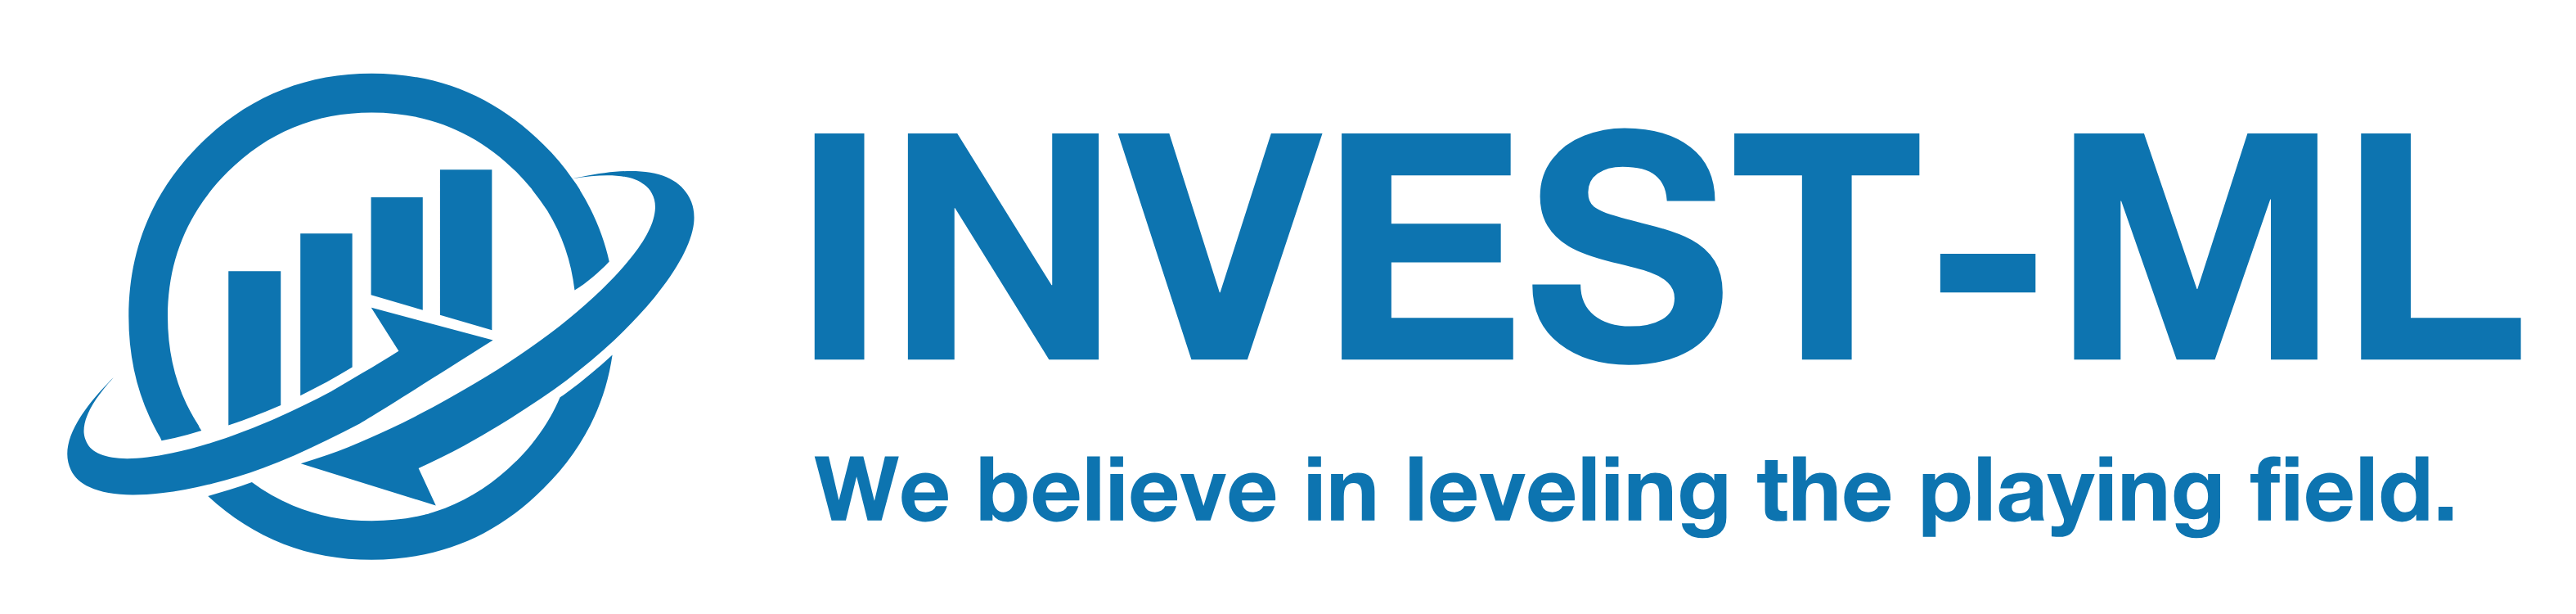 invest-ml logo